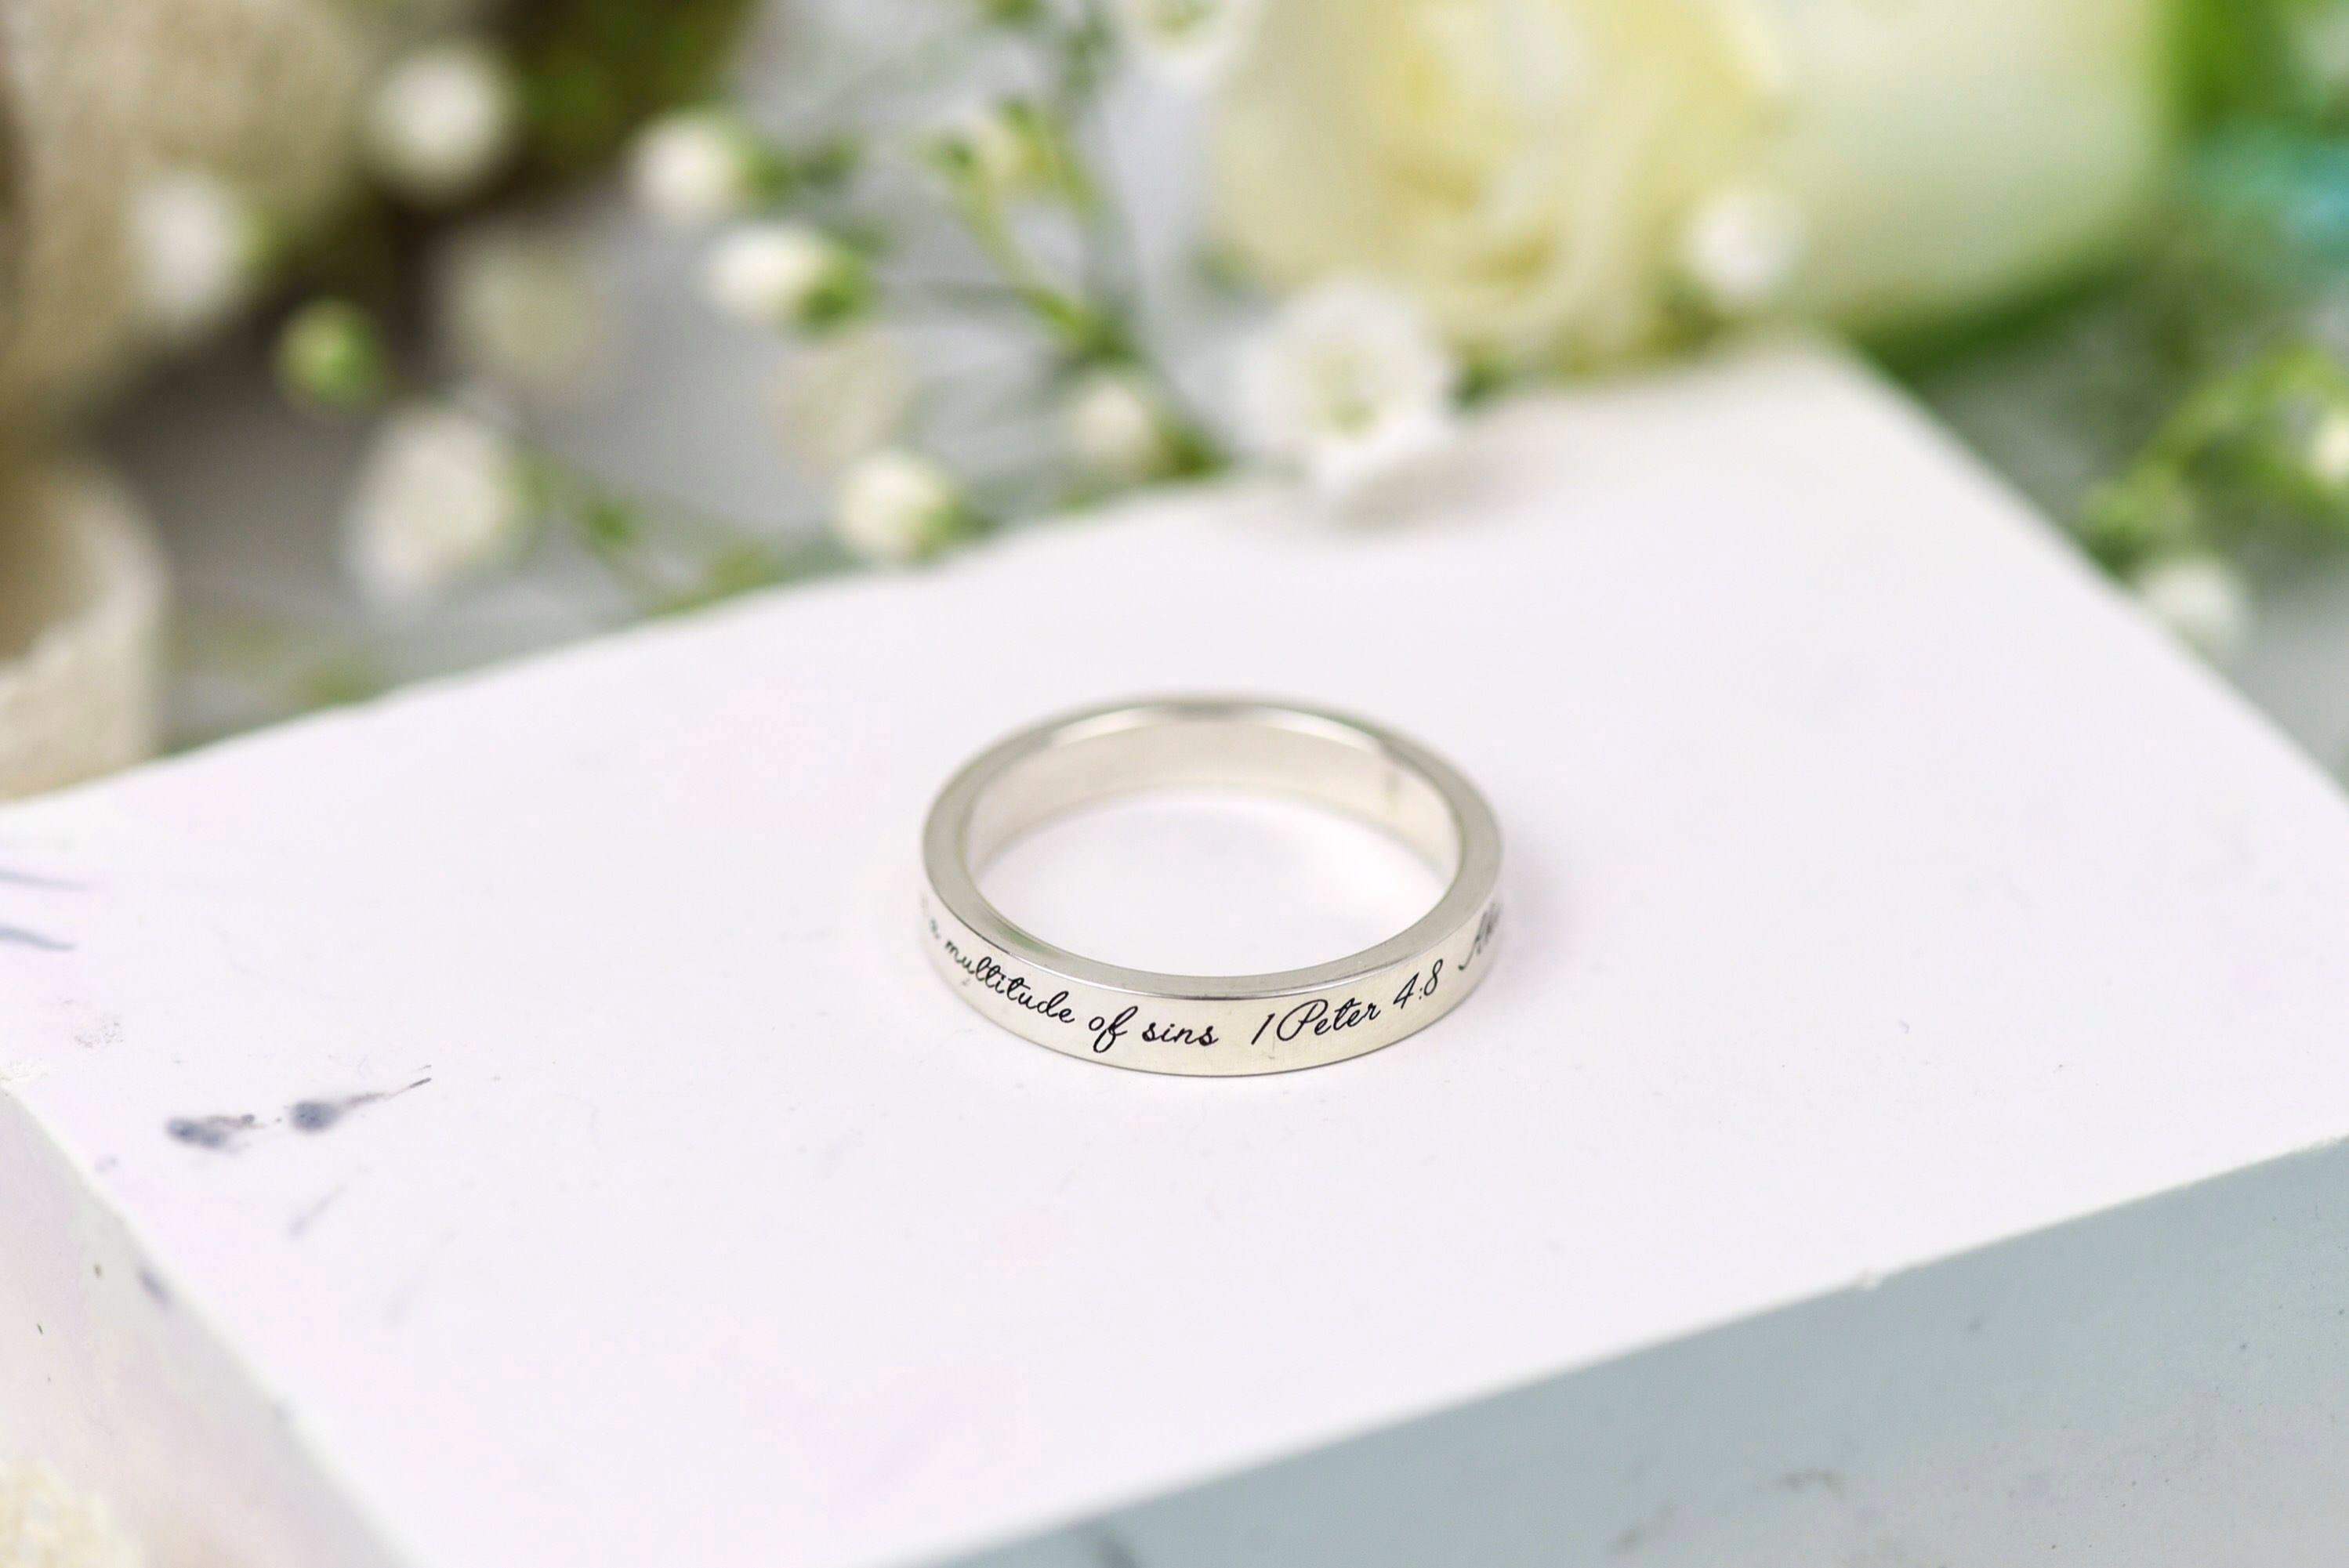 Wedding Band 1 Peter 4 8 Silver band Silver Ring Bible